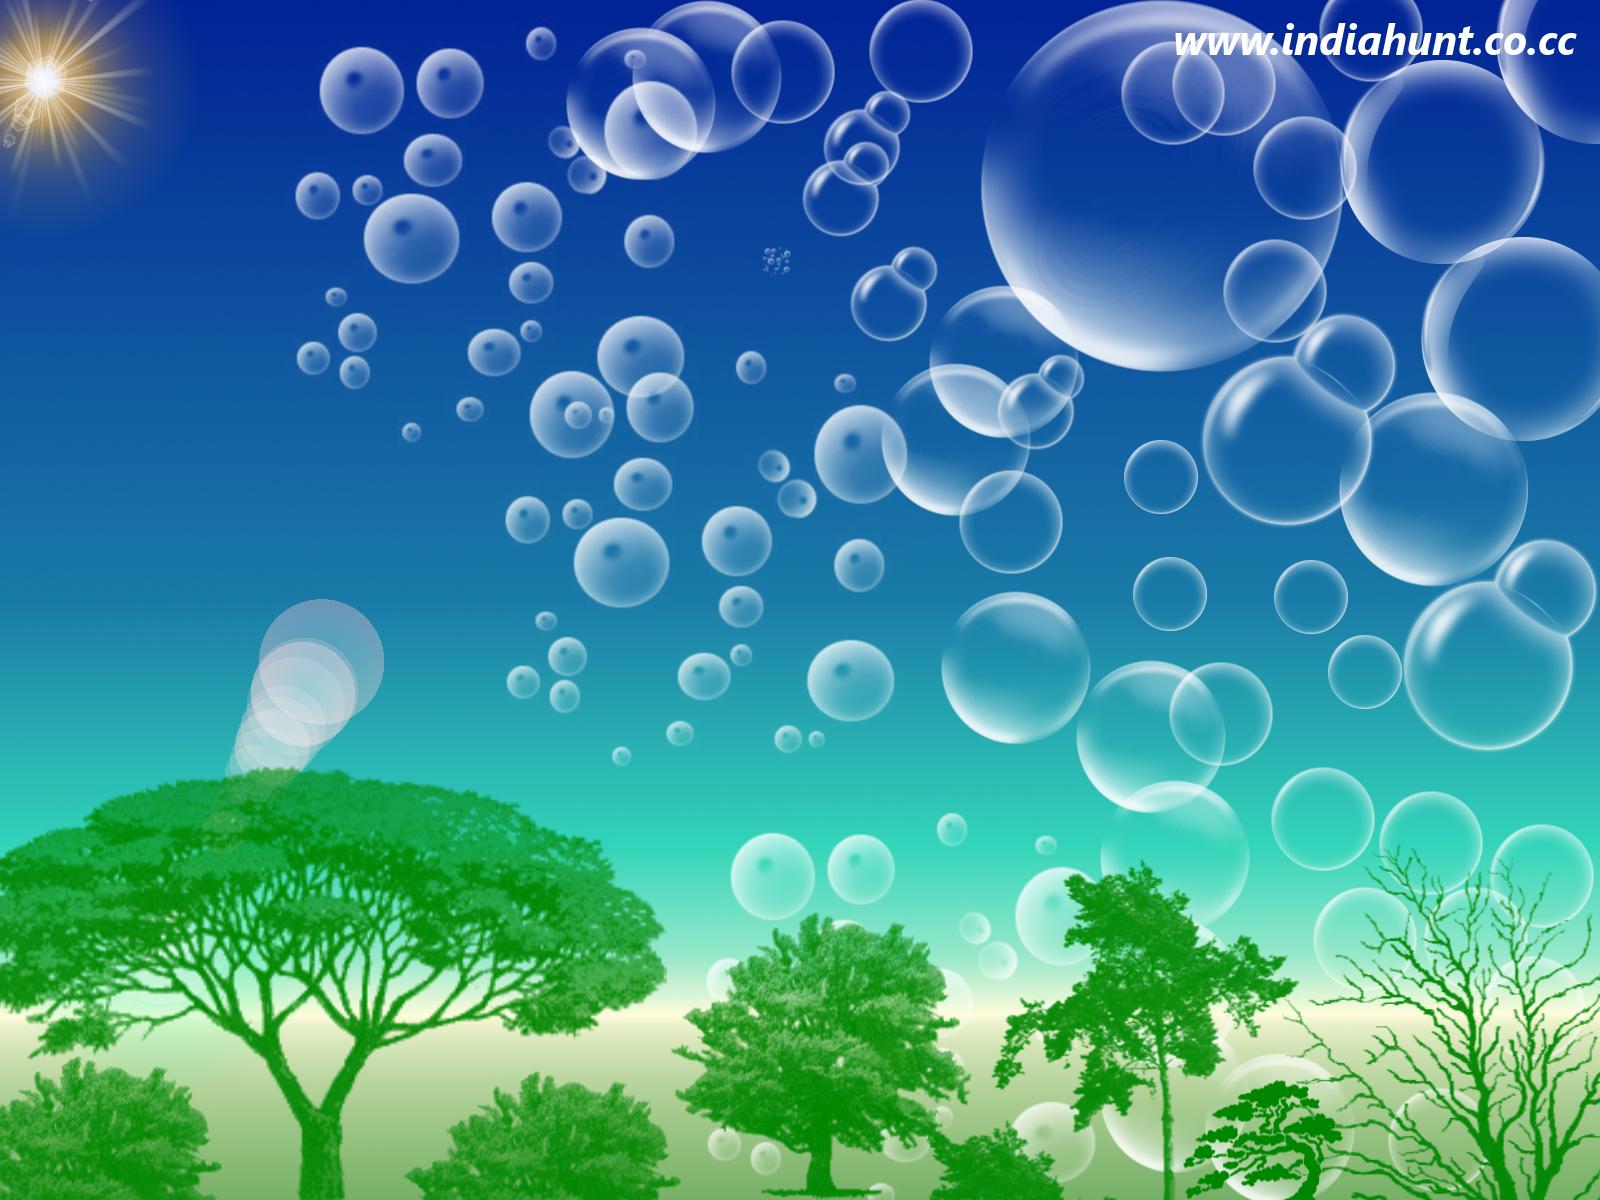 http://4.bp.blogspot.com/-ckv4Iof1zPg/TgRv_WDQ8yI/AAAAAAAAAXA/HnAvrPUnBUg/s1600/3D_Tree.png